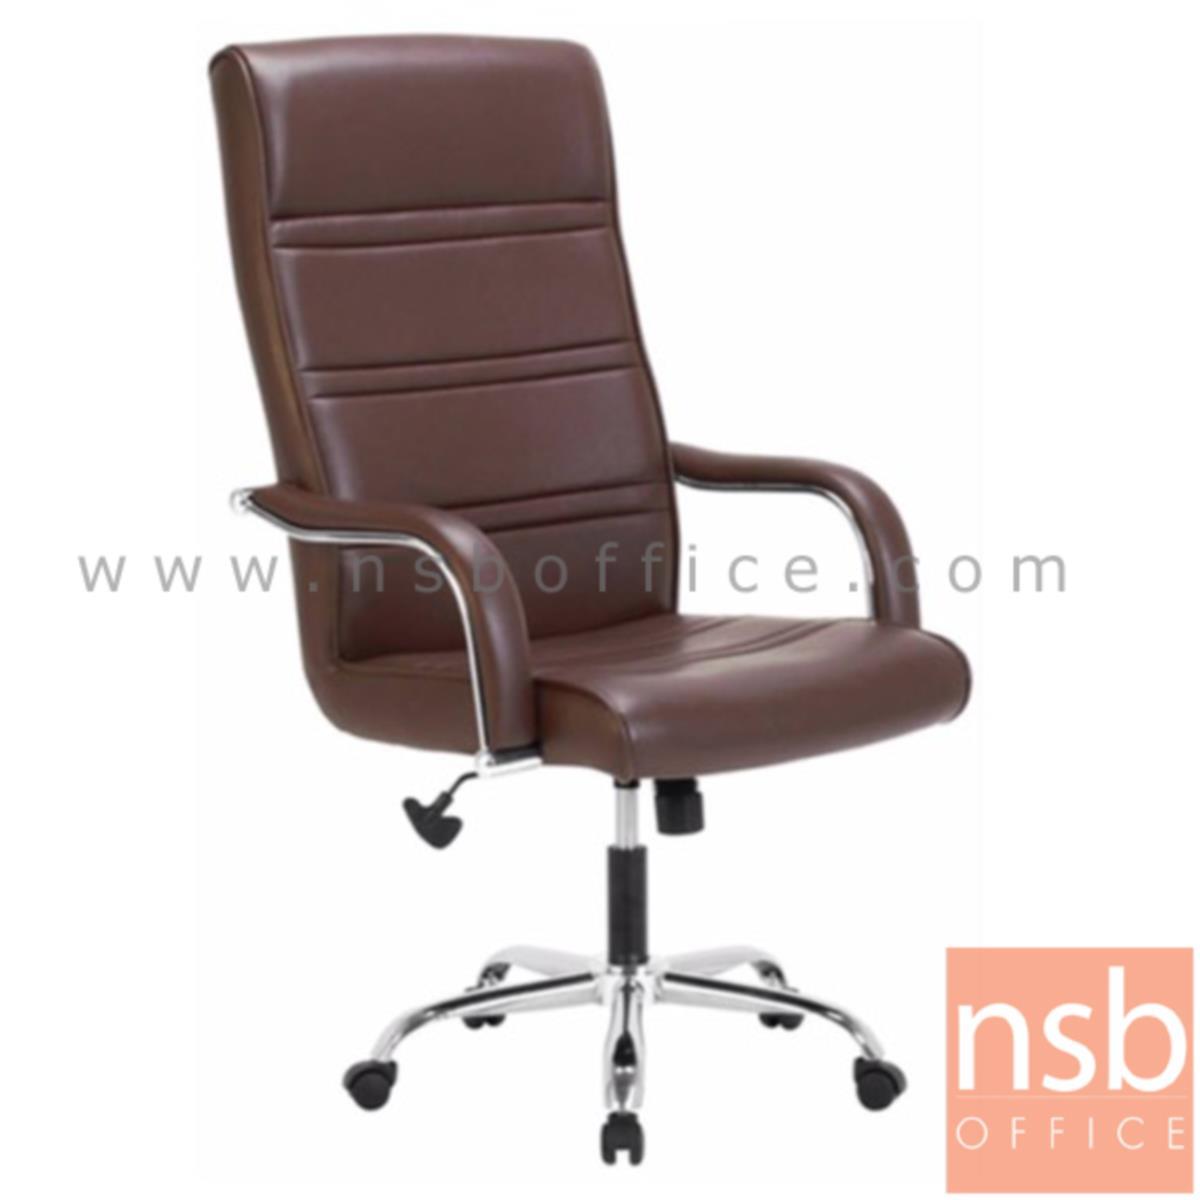 B01A477:เก้าอี้ผู้บริหาร รุ่น Mandie (แมนดี้)  โช๊คแก๊ส มีก้อนโยก ขาเหล็กชุบโครเมี่ยม